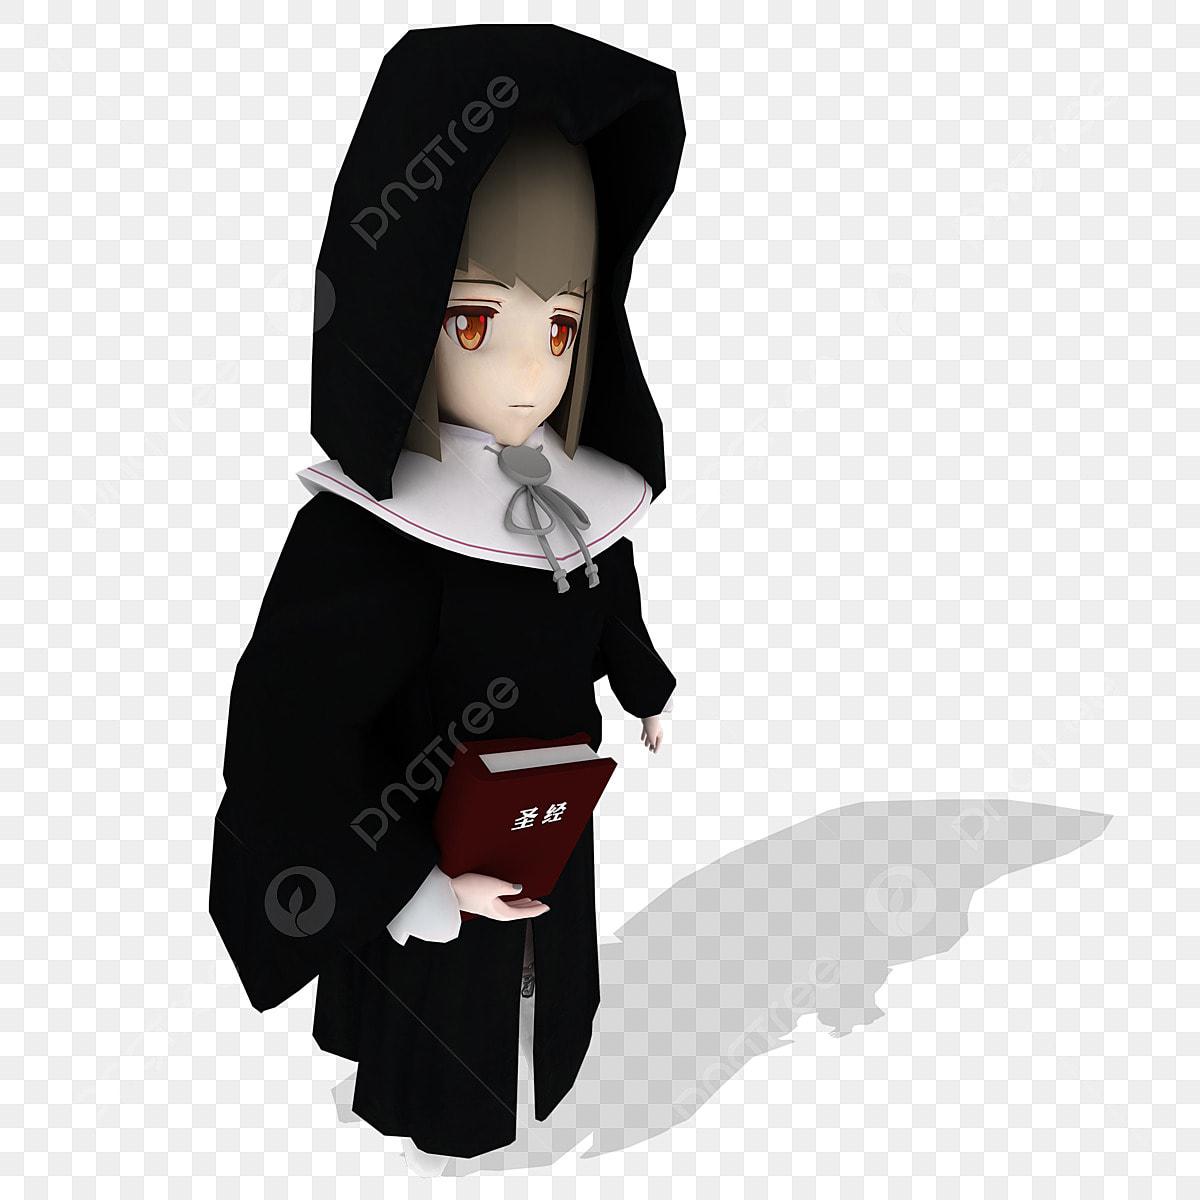 C4d Personaje C4d Monja Monja C4d Mujer Mujer Vestido De